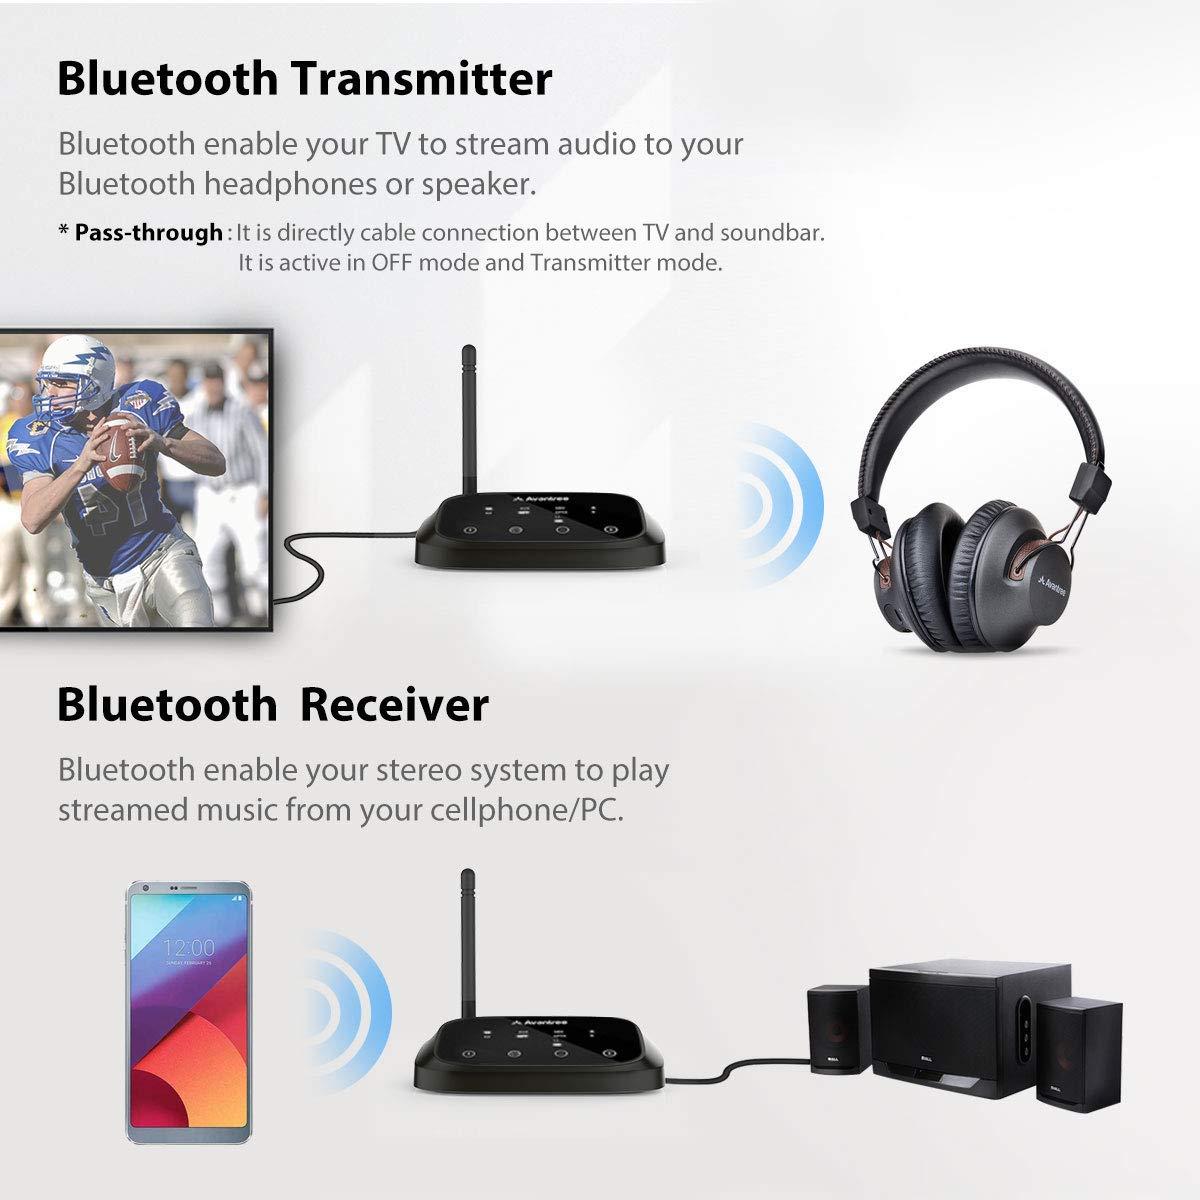 Avantree Oasis Plus aptX HD Long Range Bluetooth Transmitter